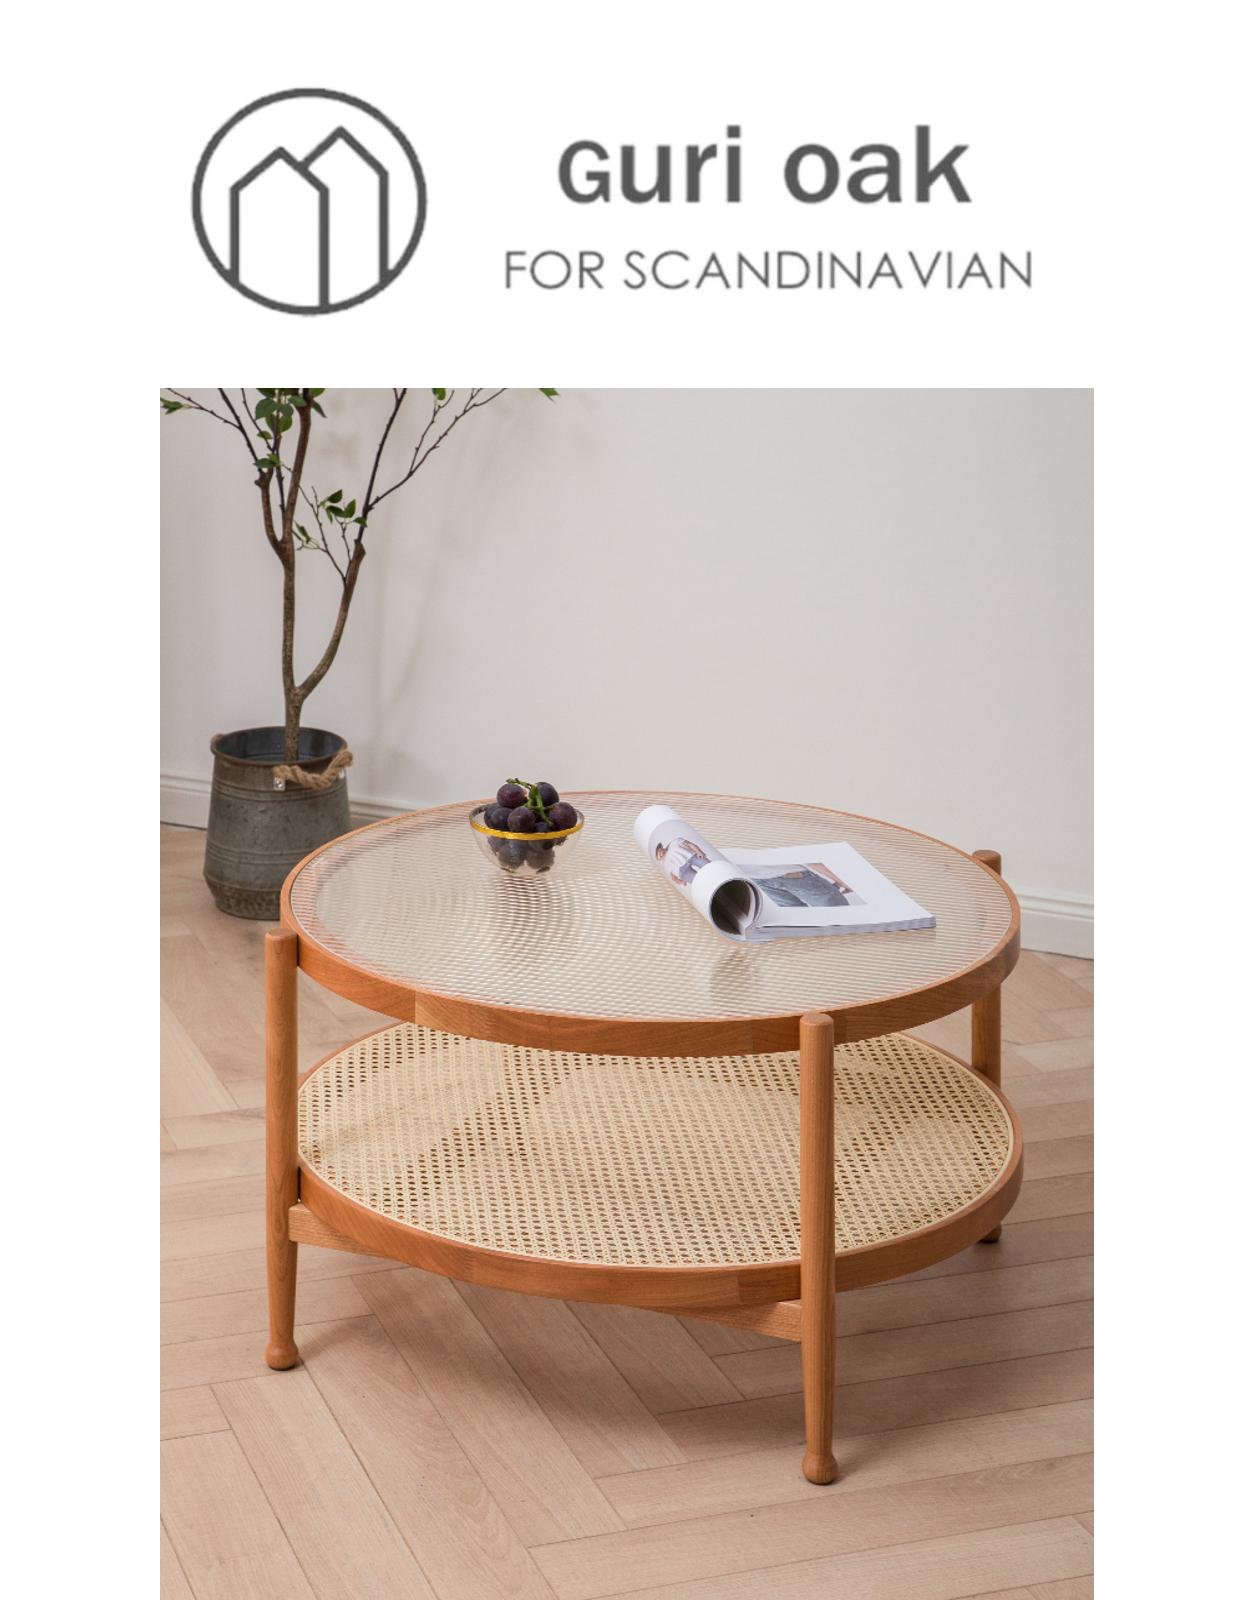 guri_oak_scandinavian_rattan_round_table_800_product_by_born_in_colour